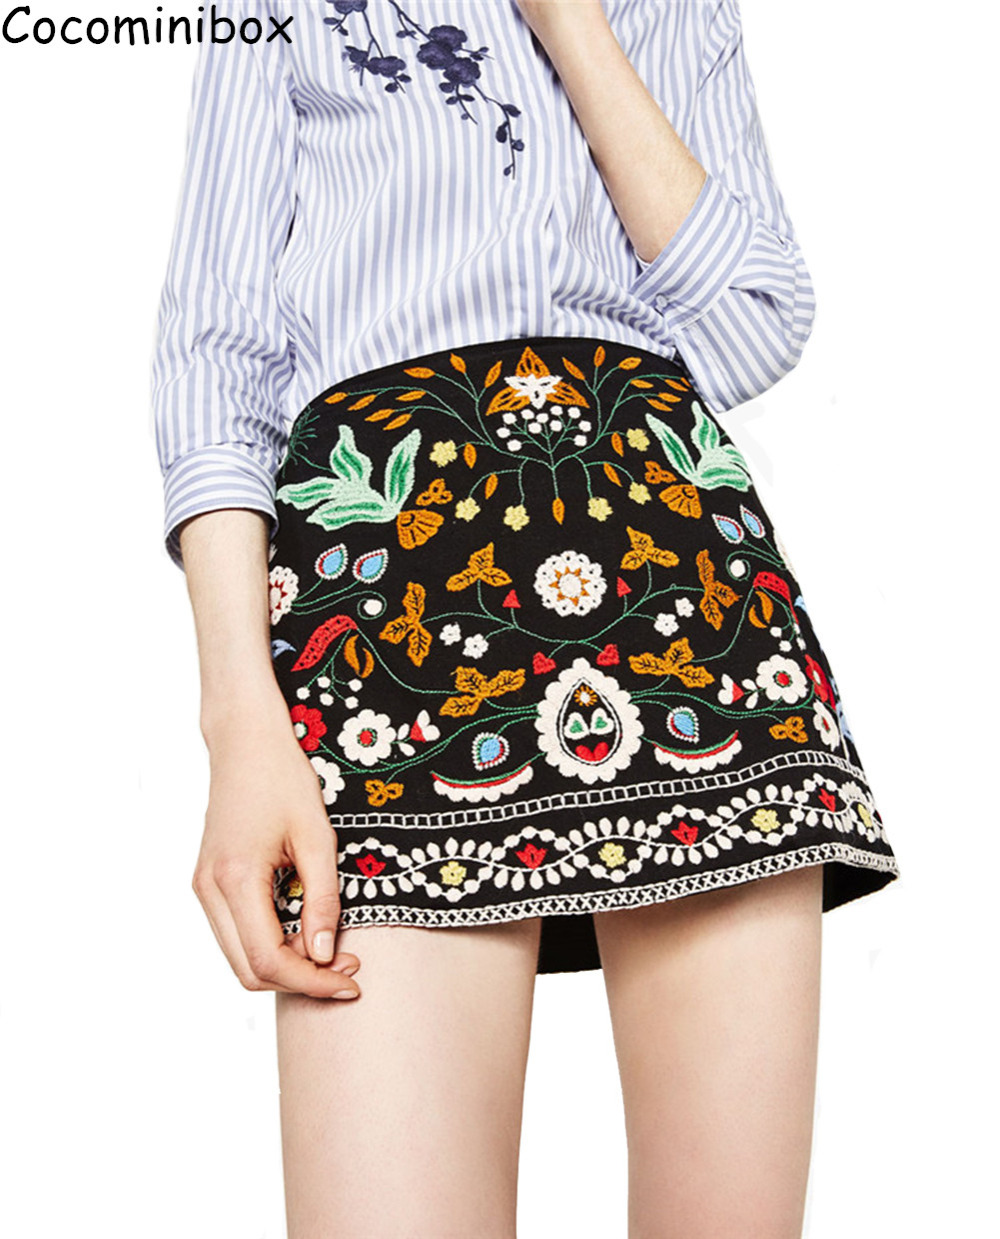 Cocominibox font b Women s b font Spring Winter Flower Embroidery font b Skirt b font